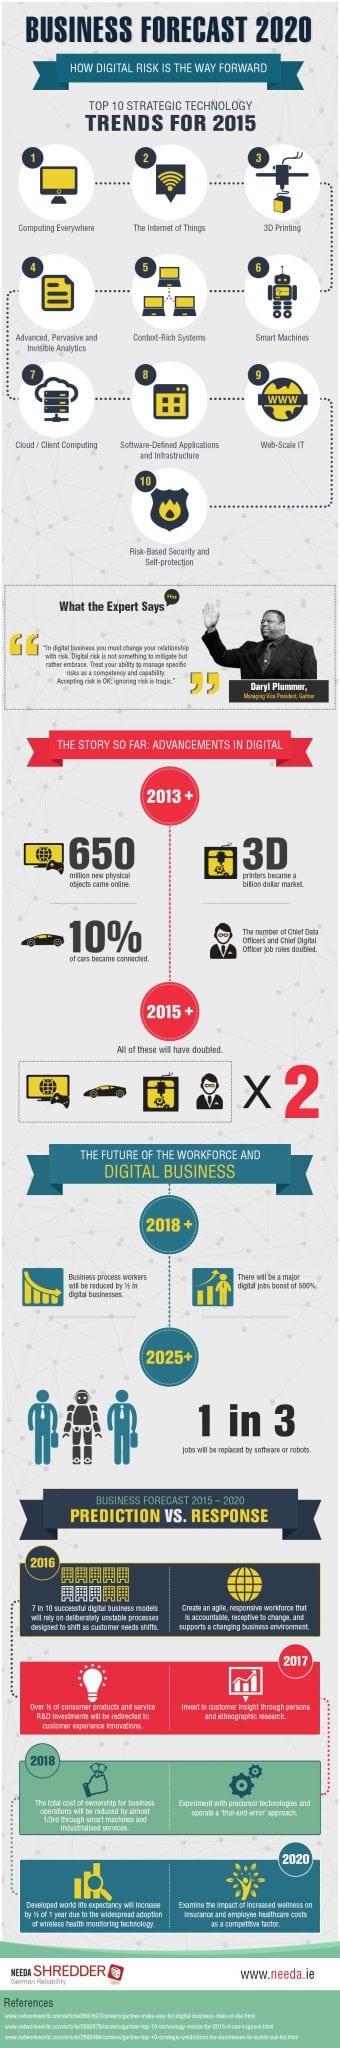 business-forecast-2020-needa.ie_